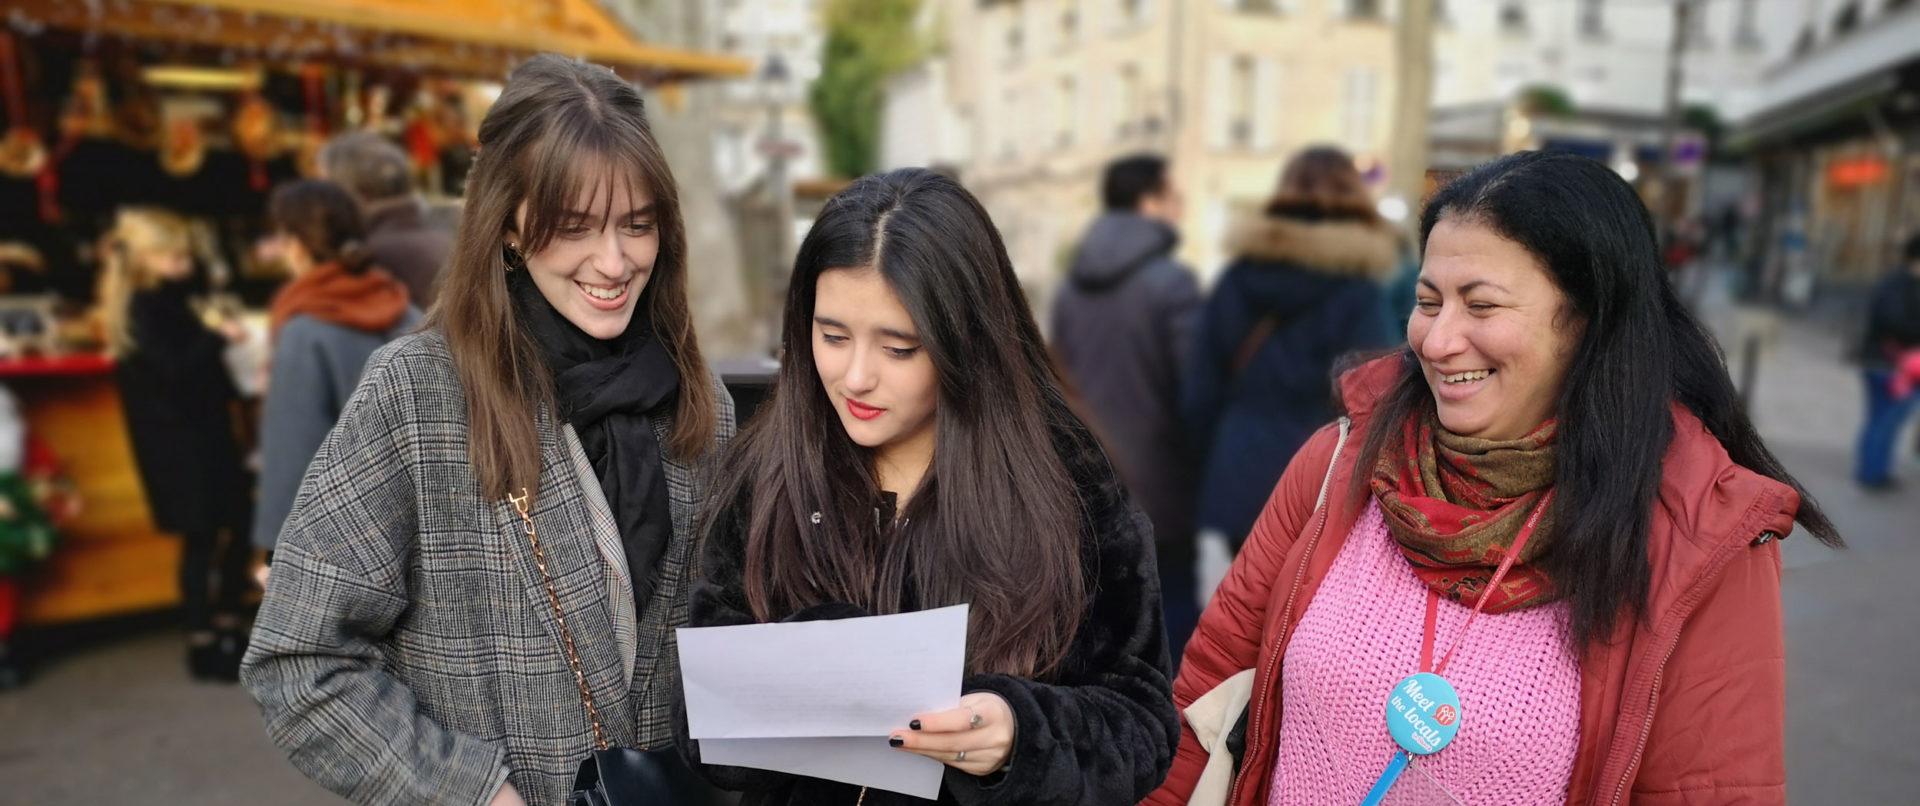 paris-for-teens-montmartre-inquiry